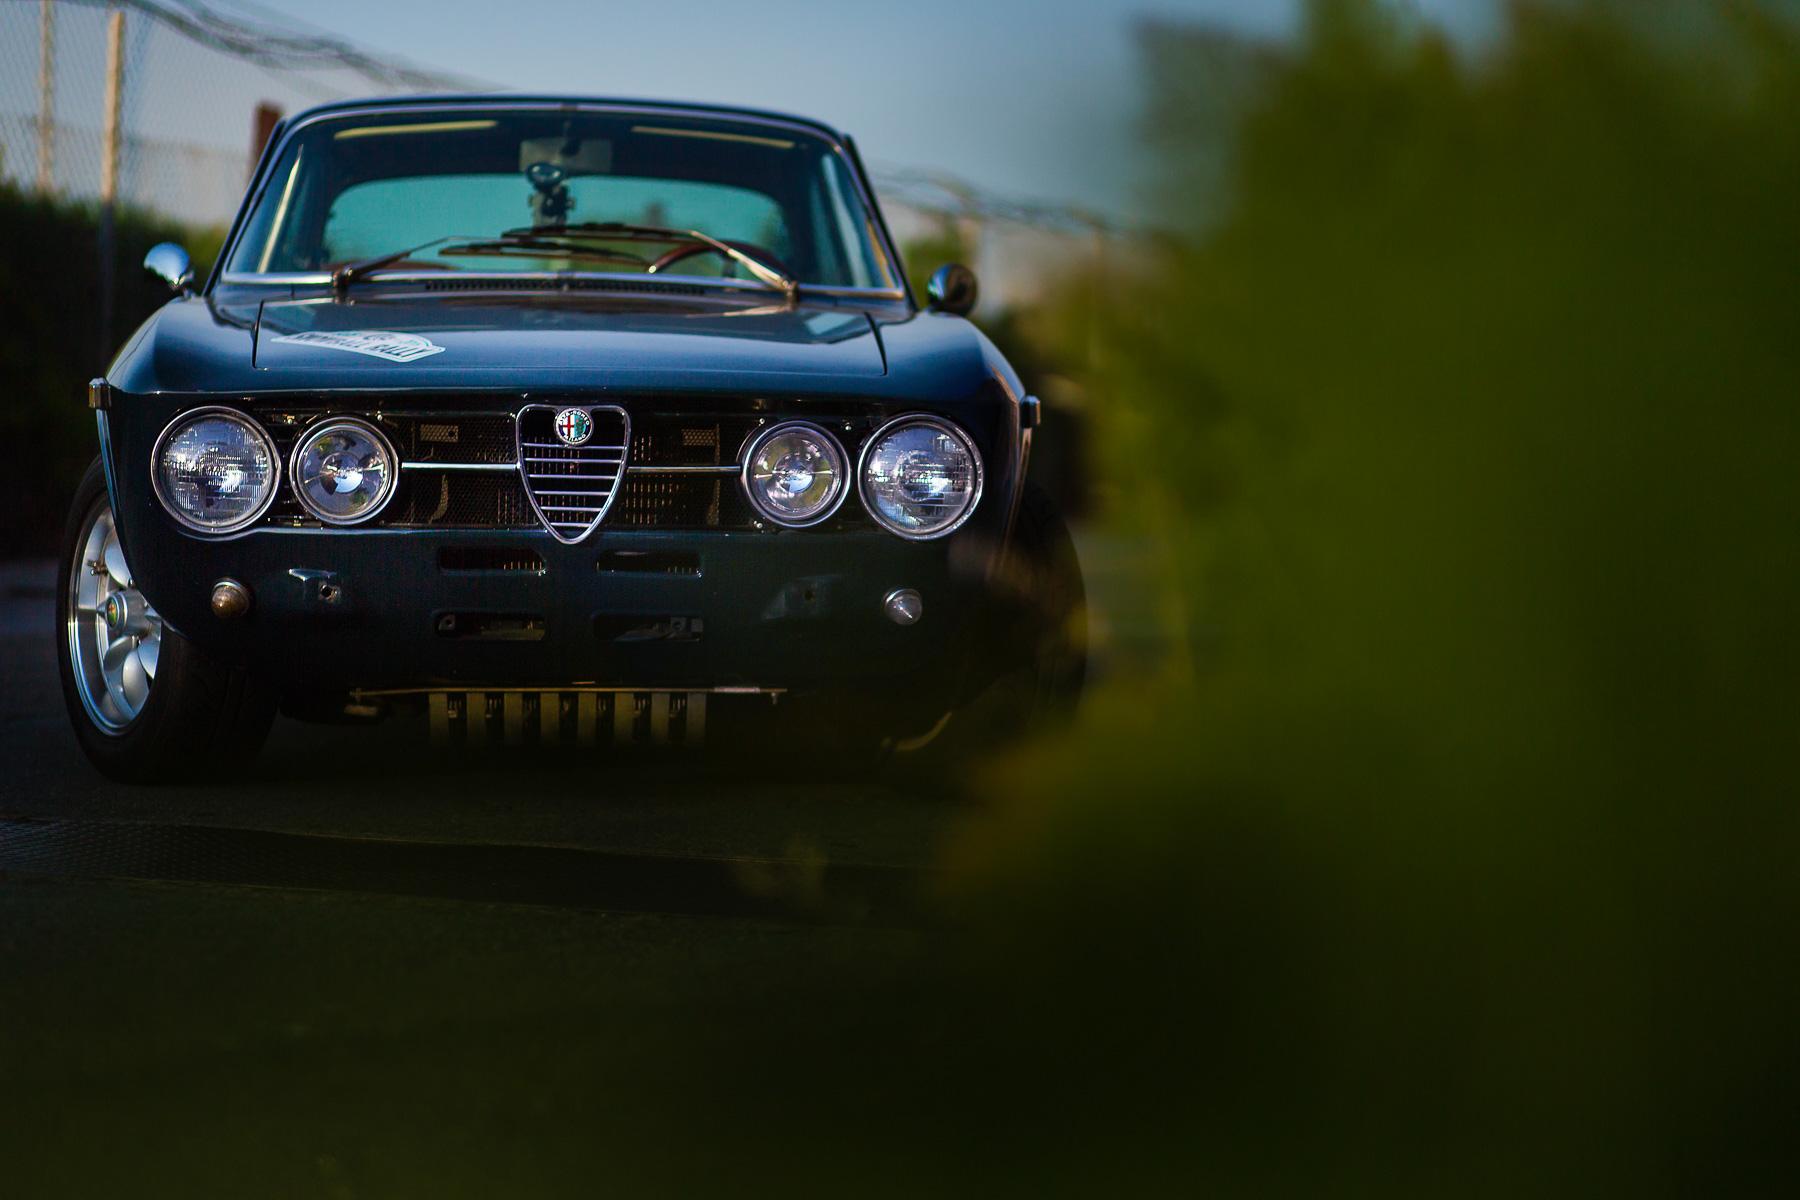 Pier_70_Alfa_Romeo_GTV